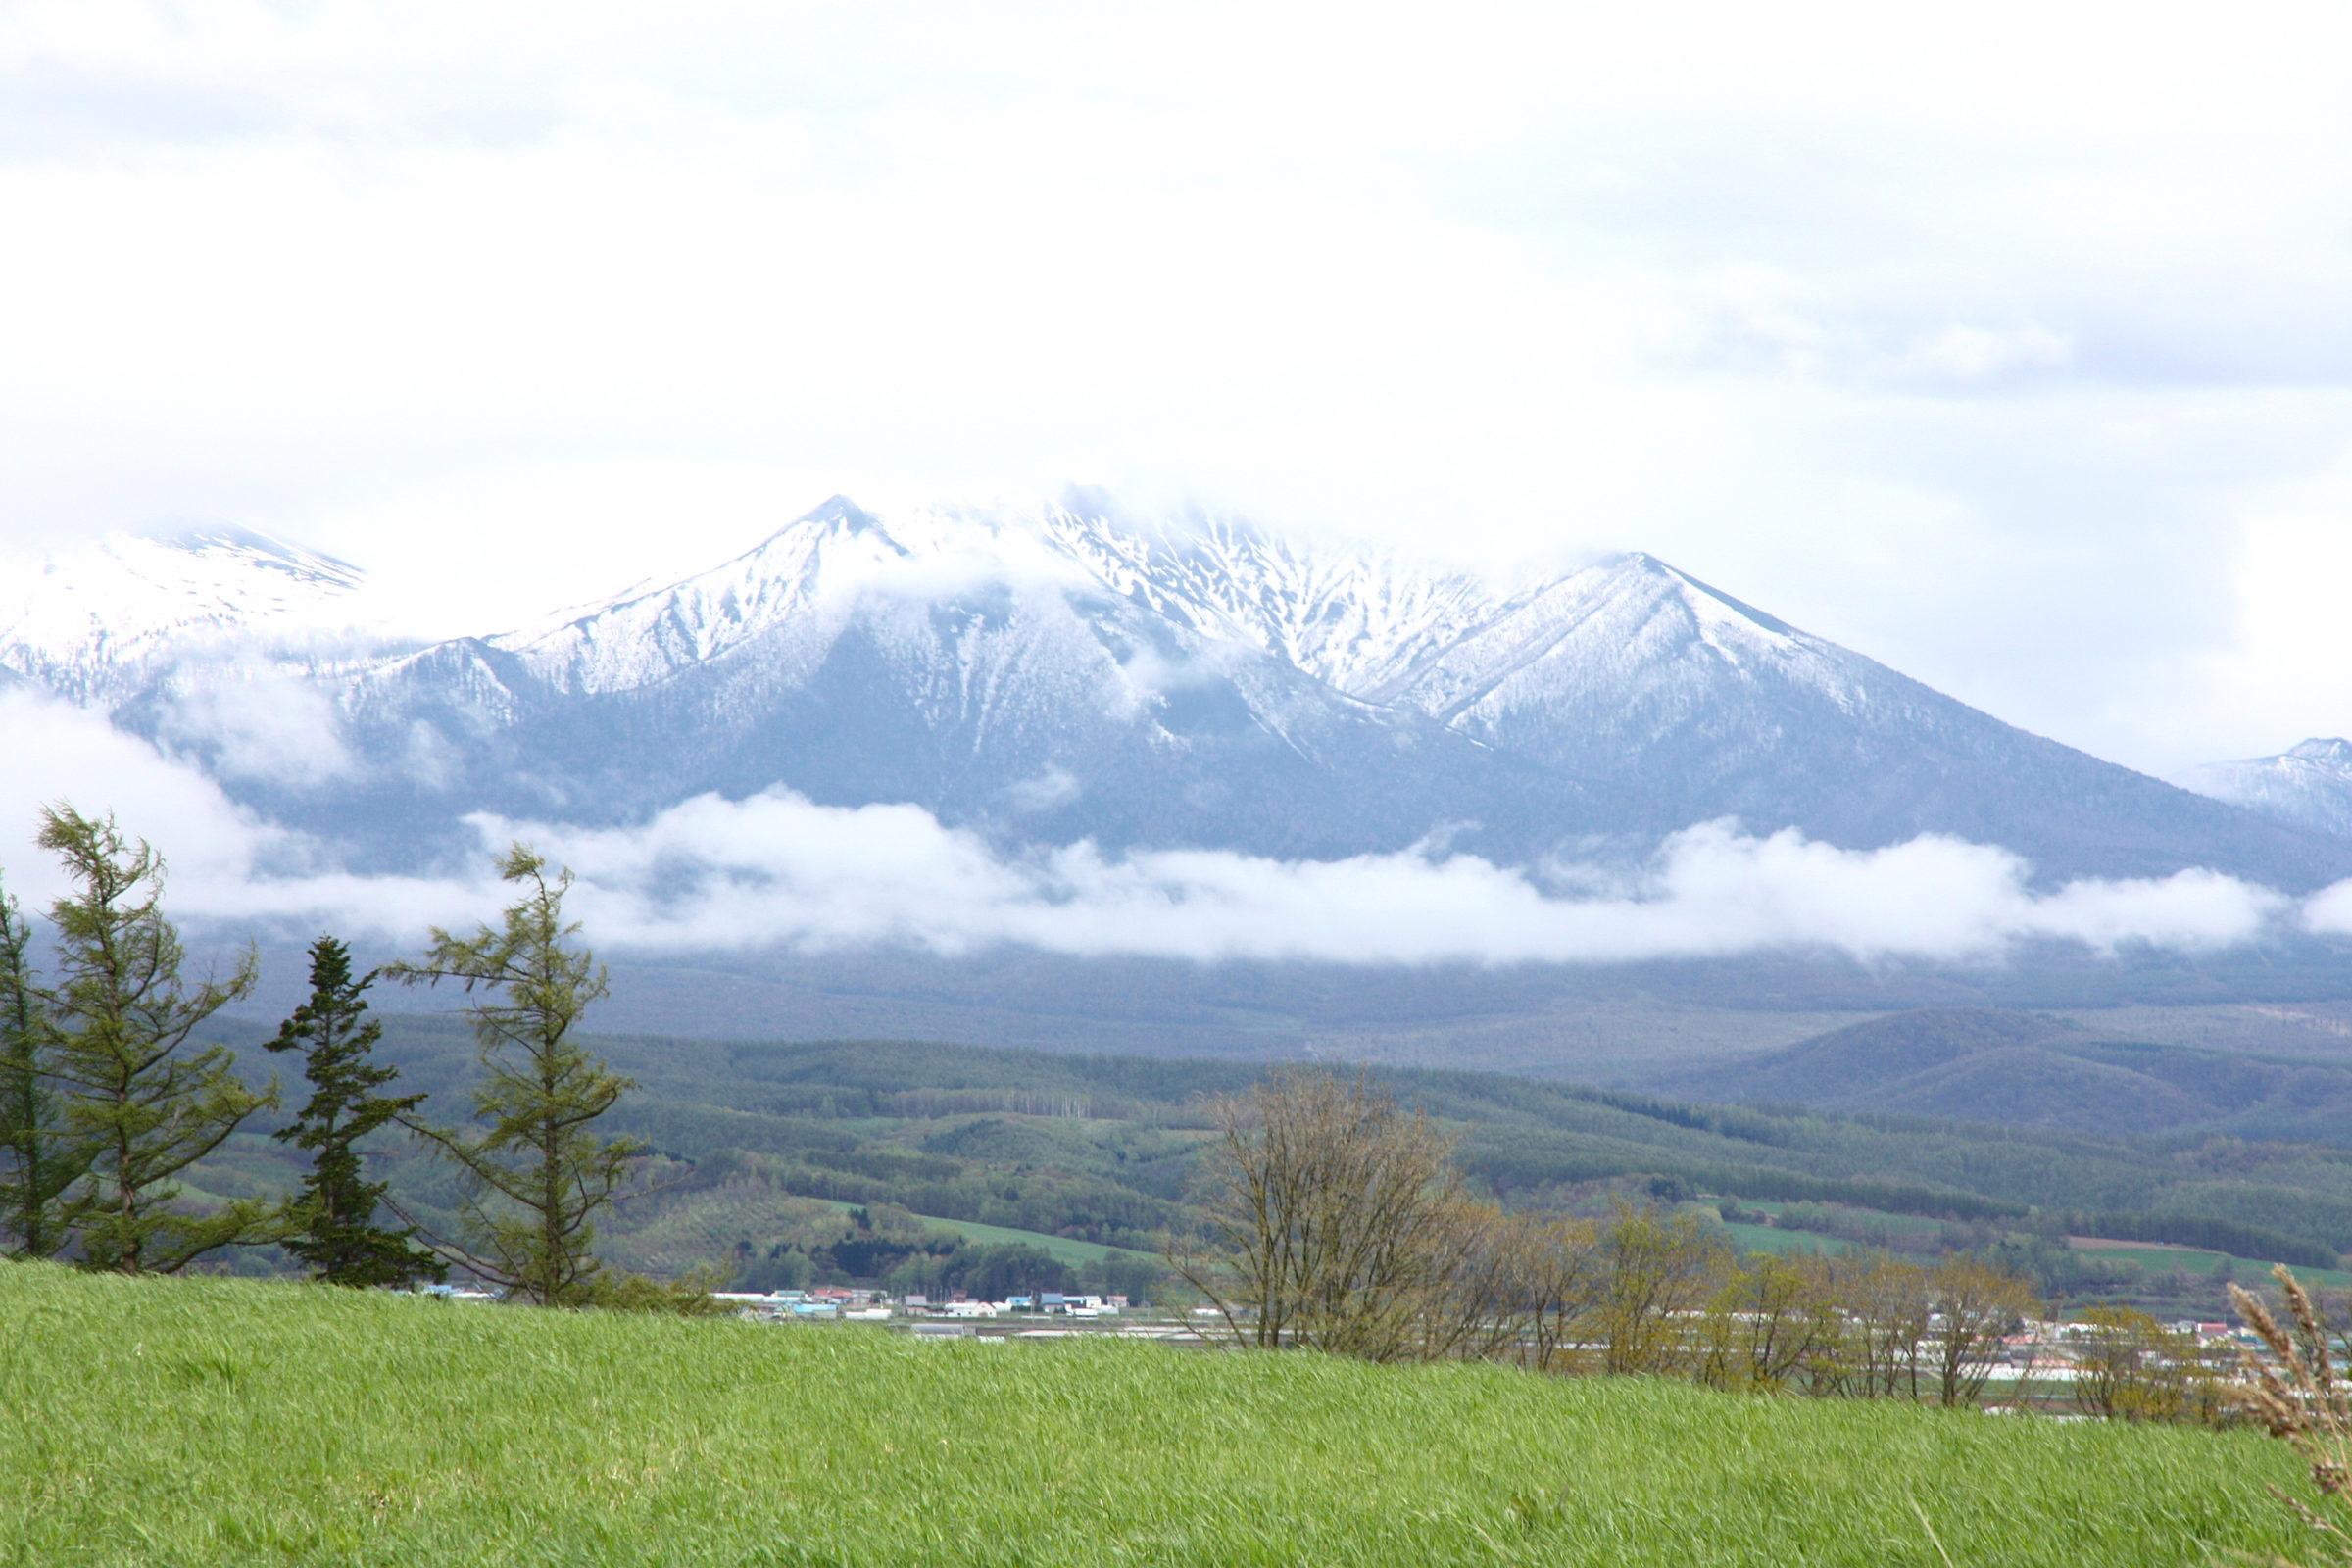 A Day in Furano & Biei (Photos)